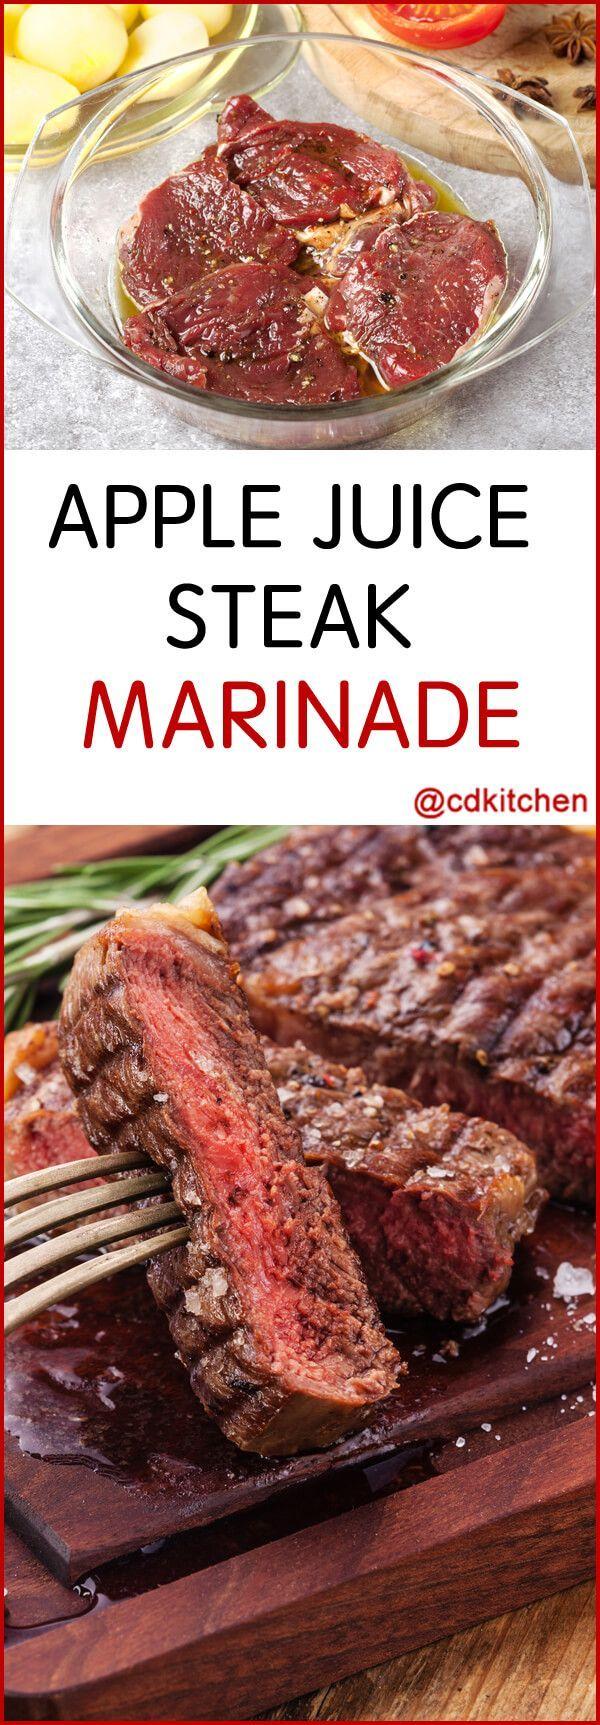 Apple Juice Steak Marinade - Recipe is made with garlic powder, apple juice, Worcestershire sauce, black pepper, Italian seasoning   CDKitchen.com